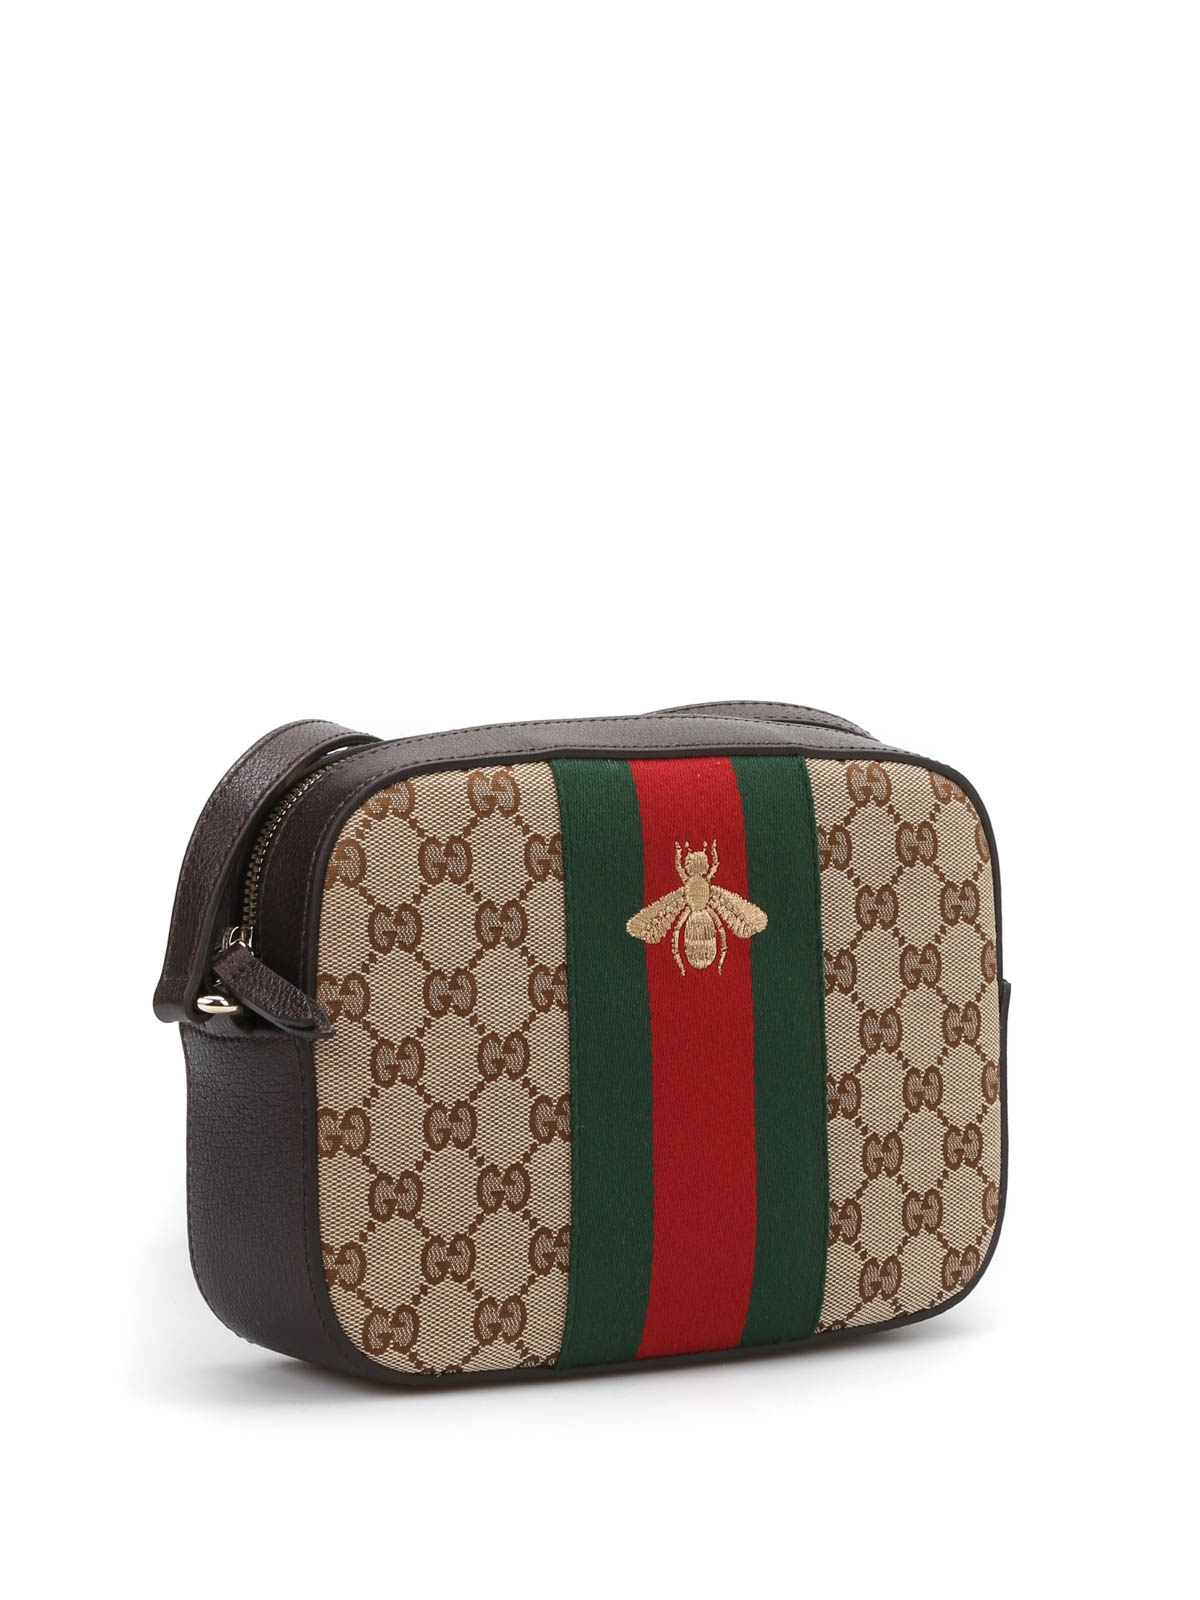 Gucci Crossbody Bee Bag